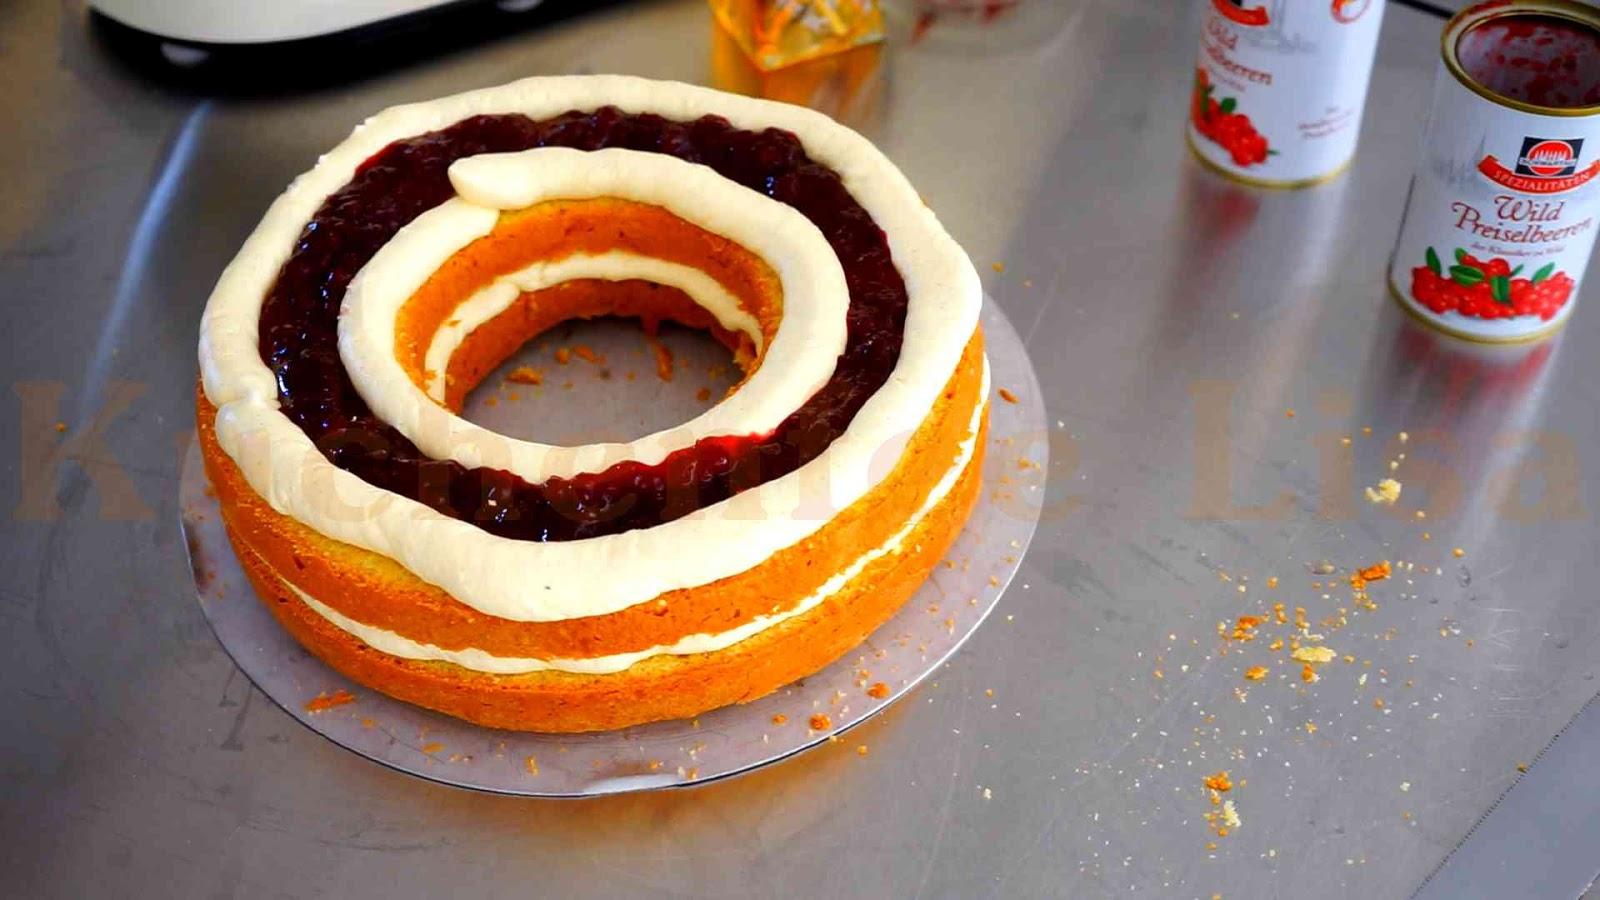 Kuchenfee Lisa Buttercreme ~ frankfurter kranz kuchenfee lisa